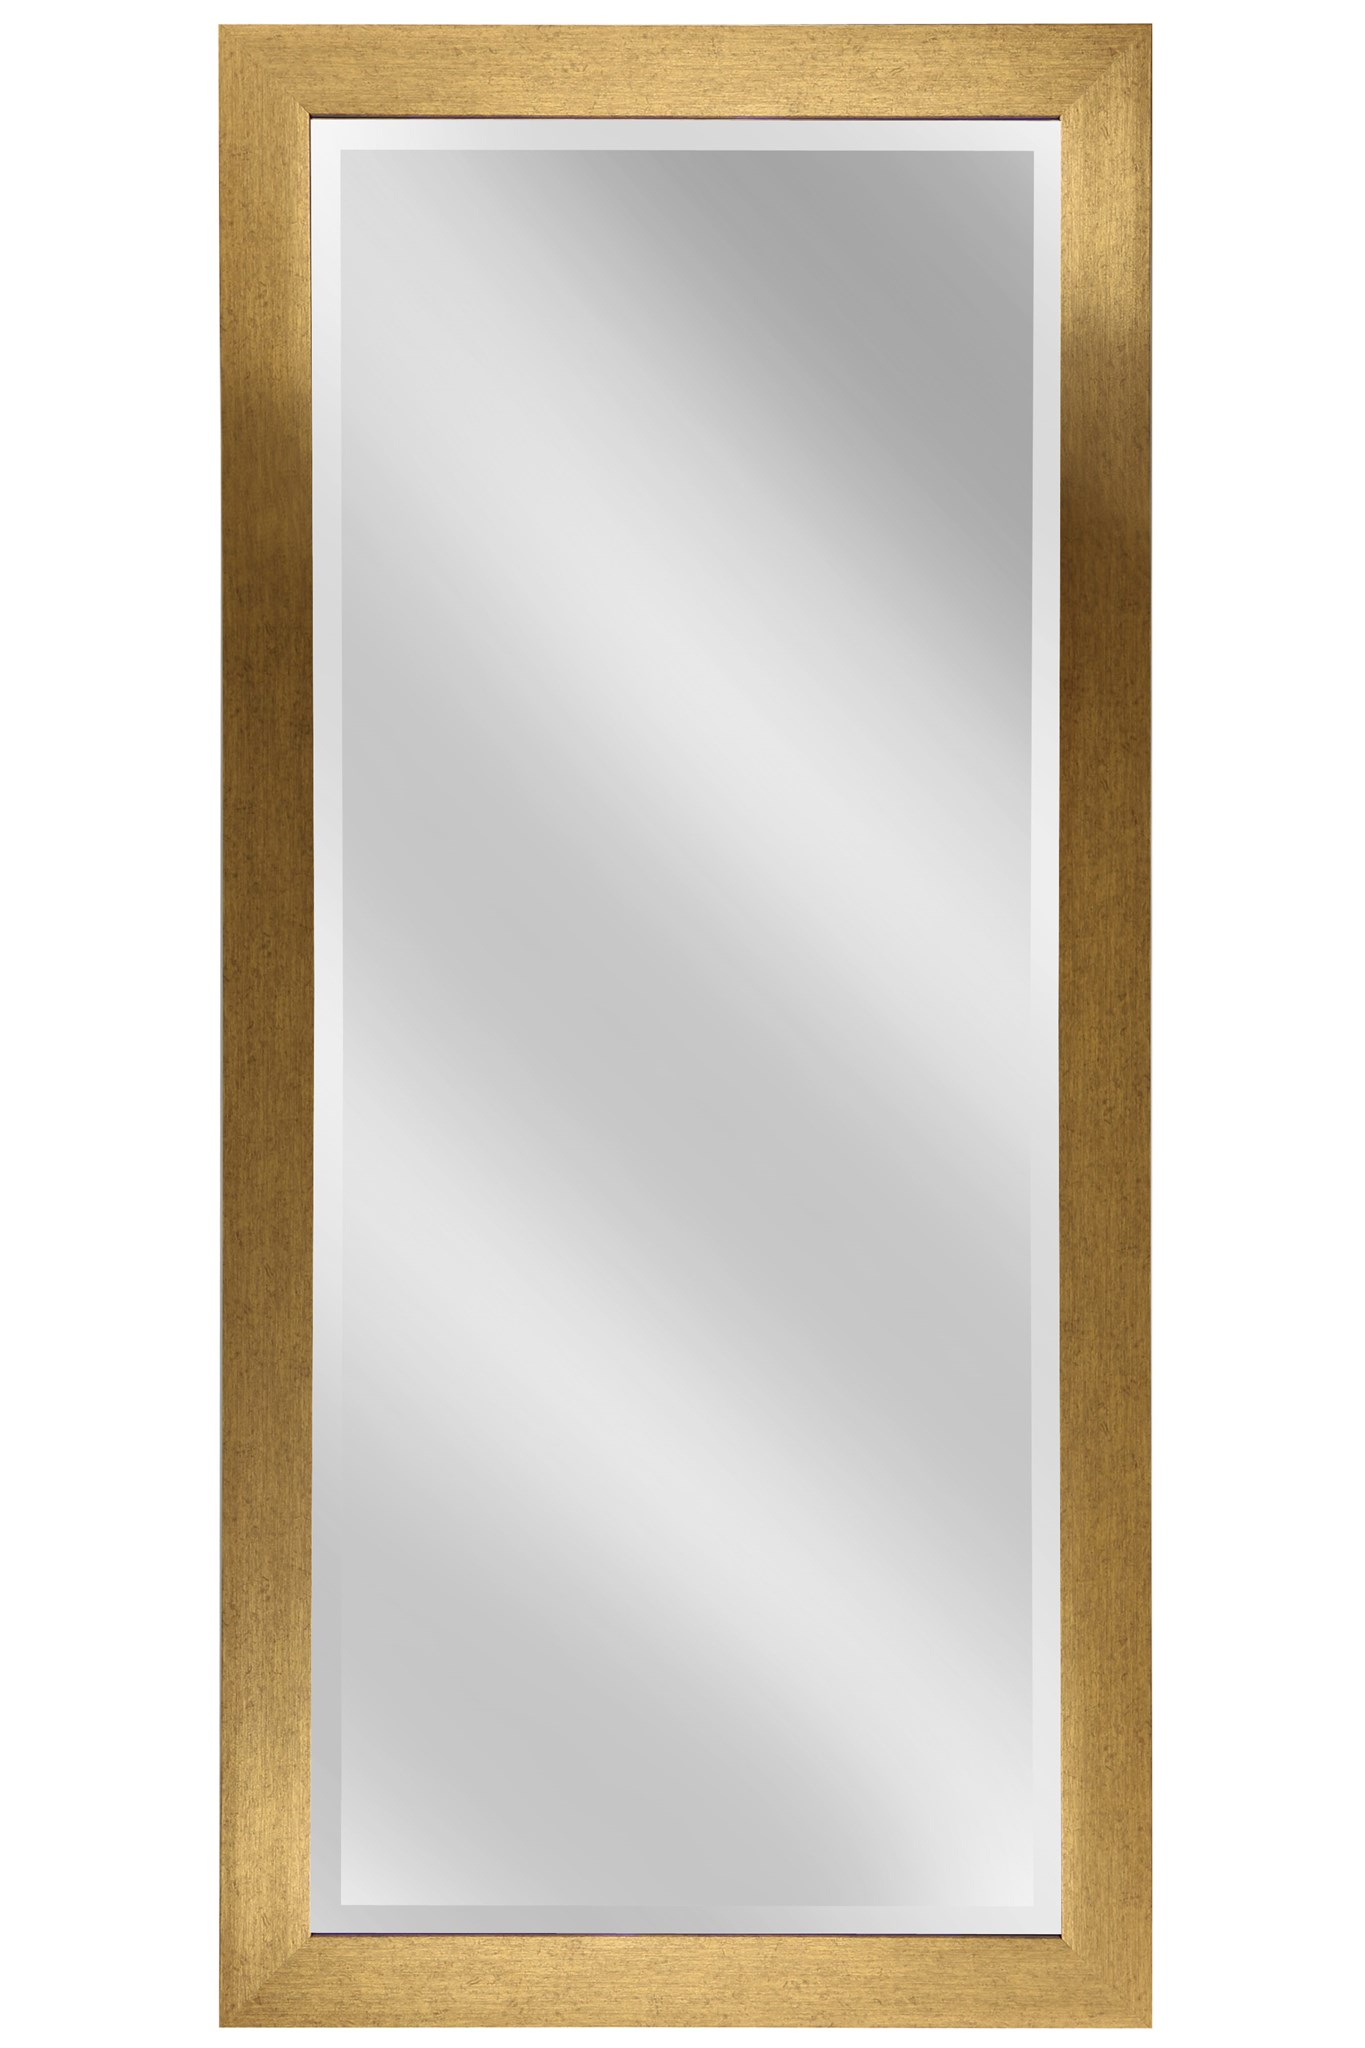 Honey Oak Framed Wall Mirror - Boulevard Urban Living